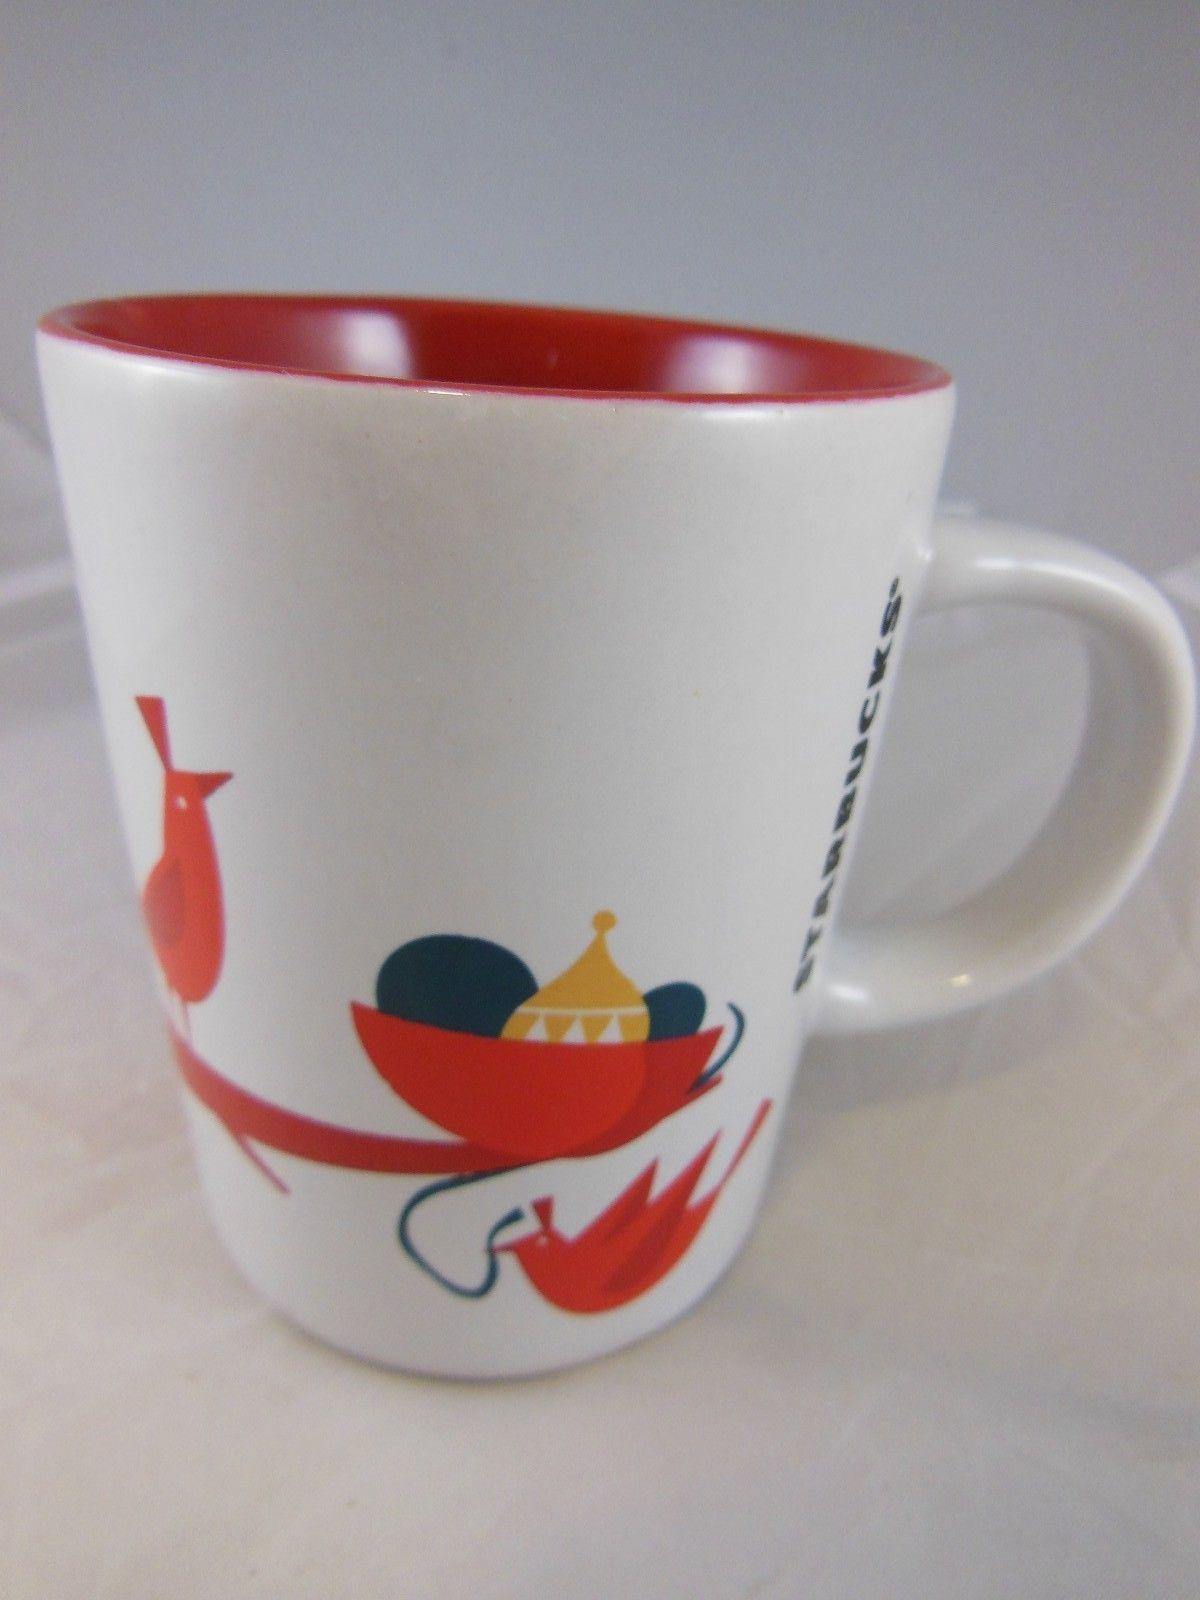 Beautiful Starbucks Christmas Mug With Red Birds Starbucks